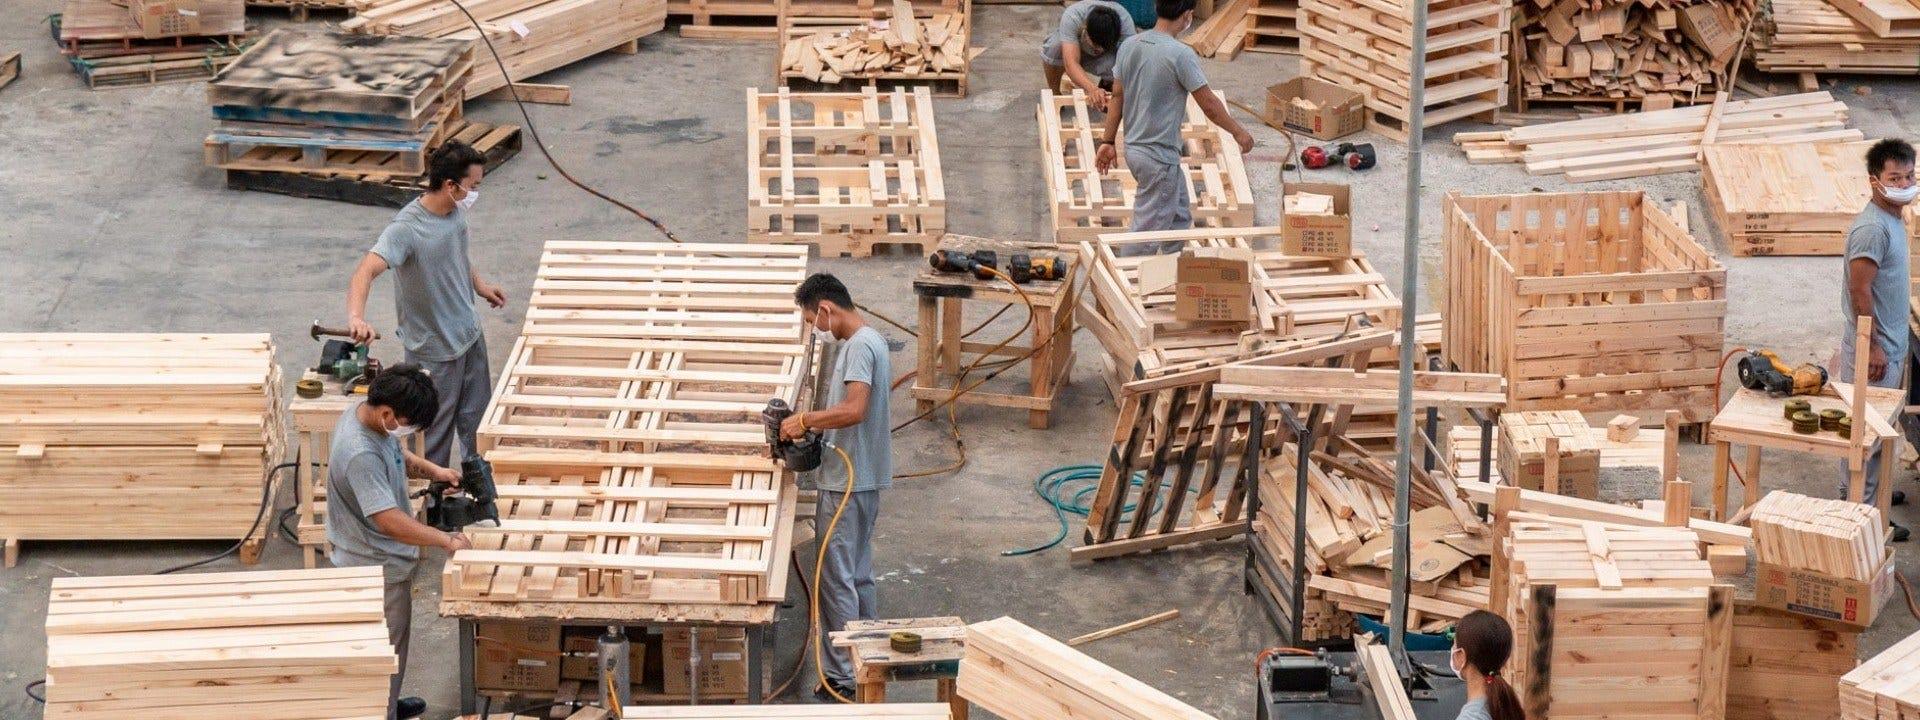 Pallet Maker Group Co. , Thailand